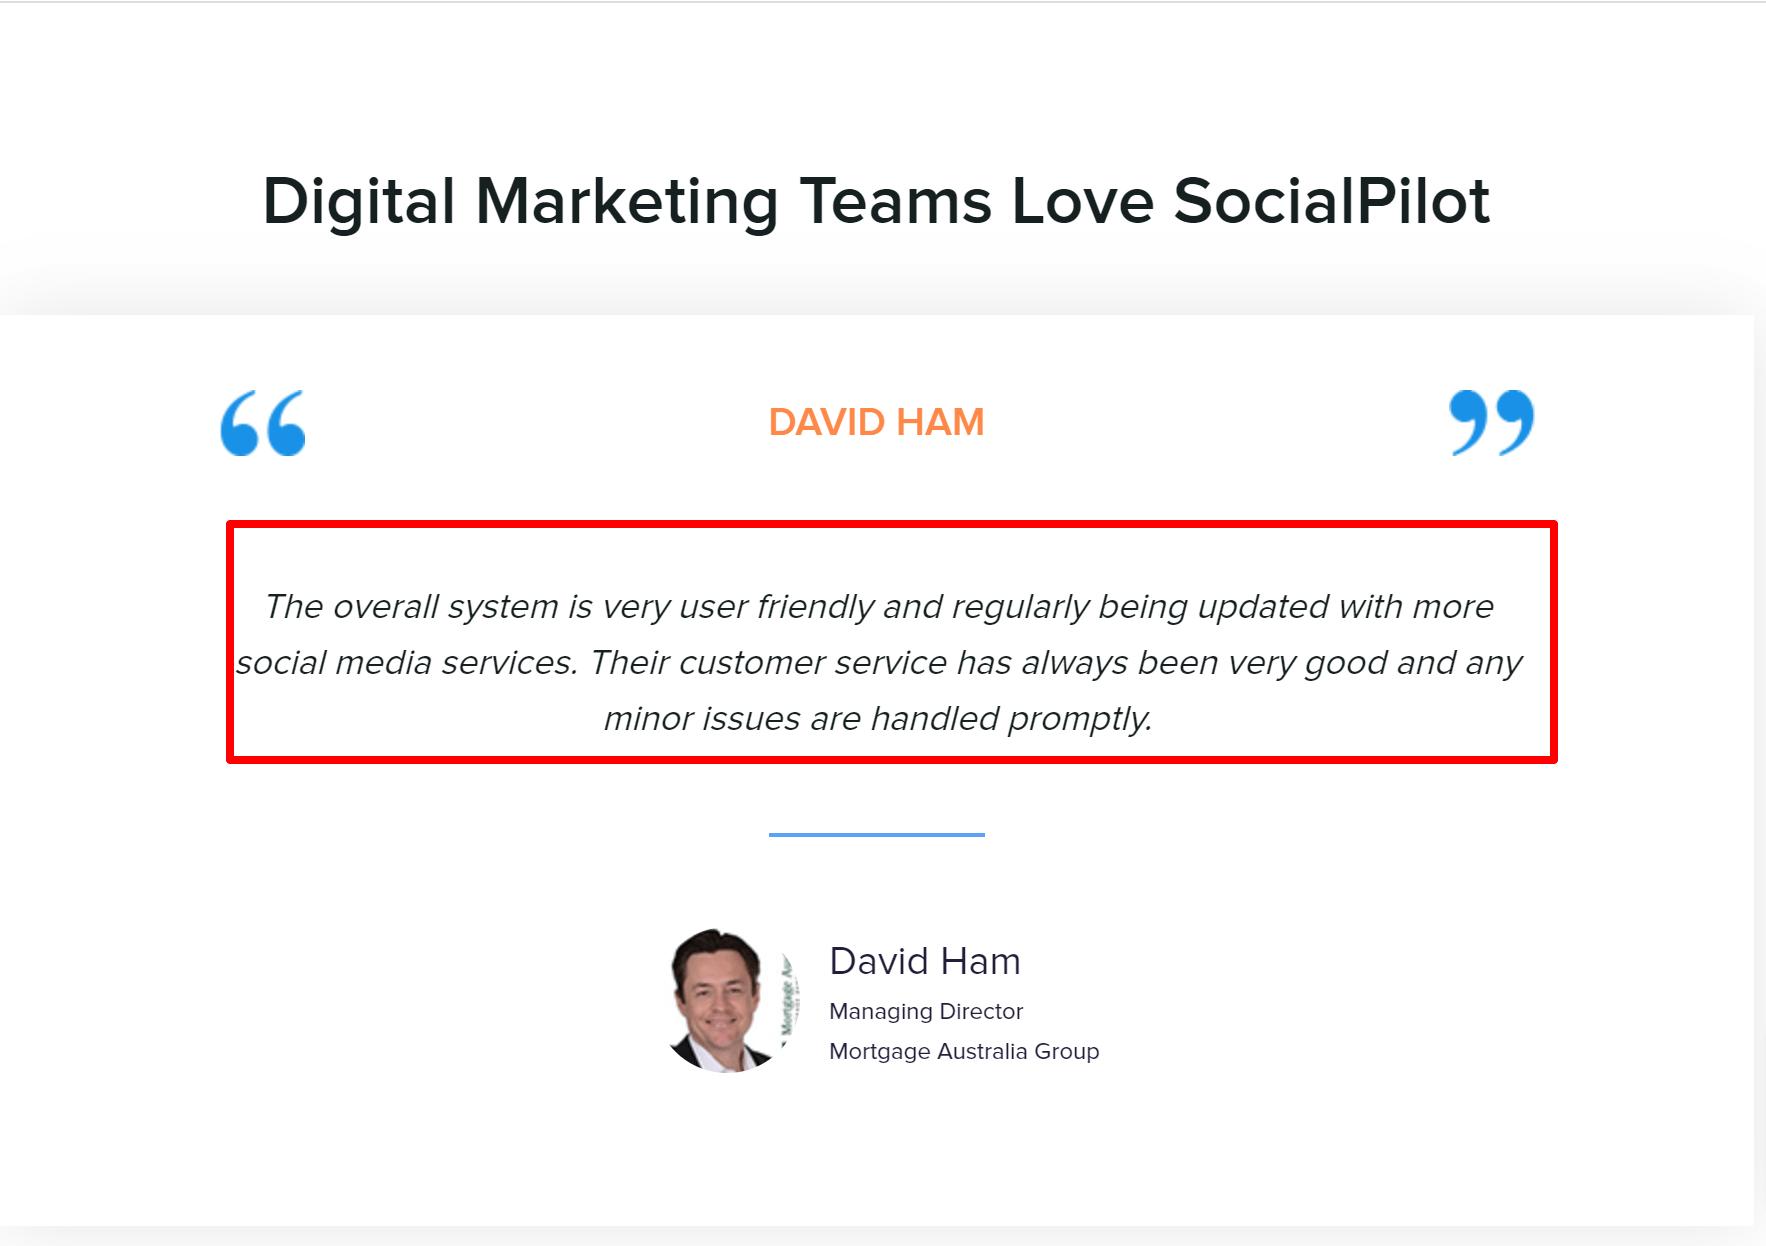 SocialPilot customer reviews